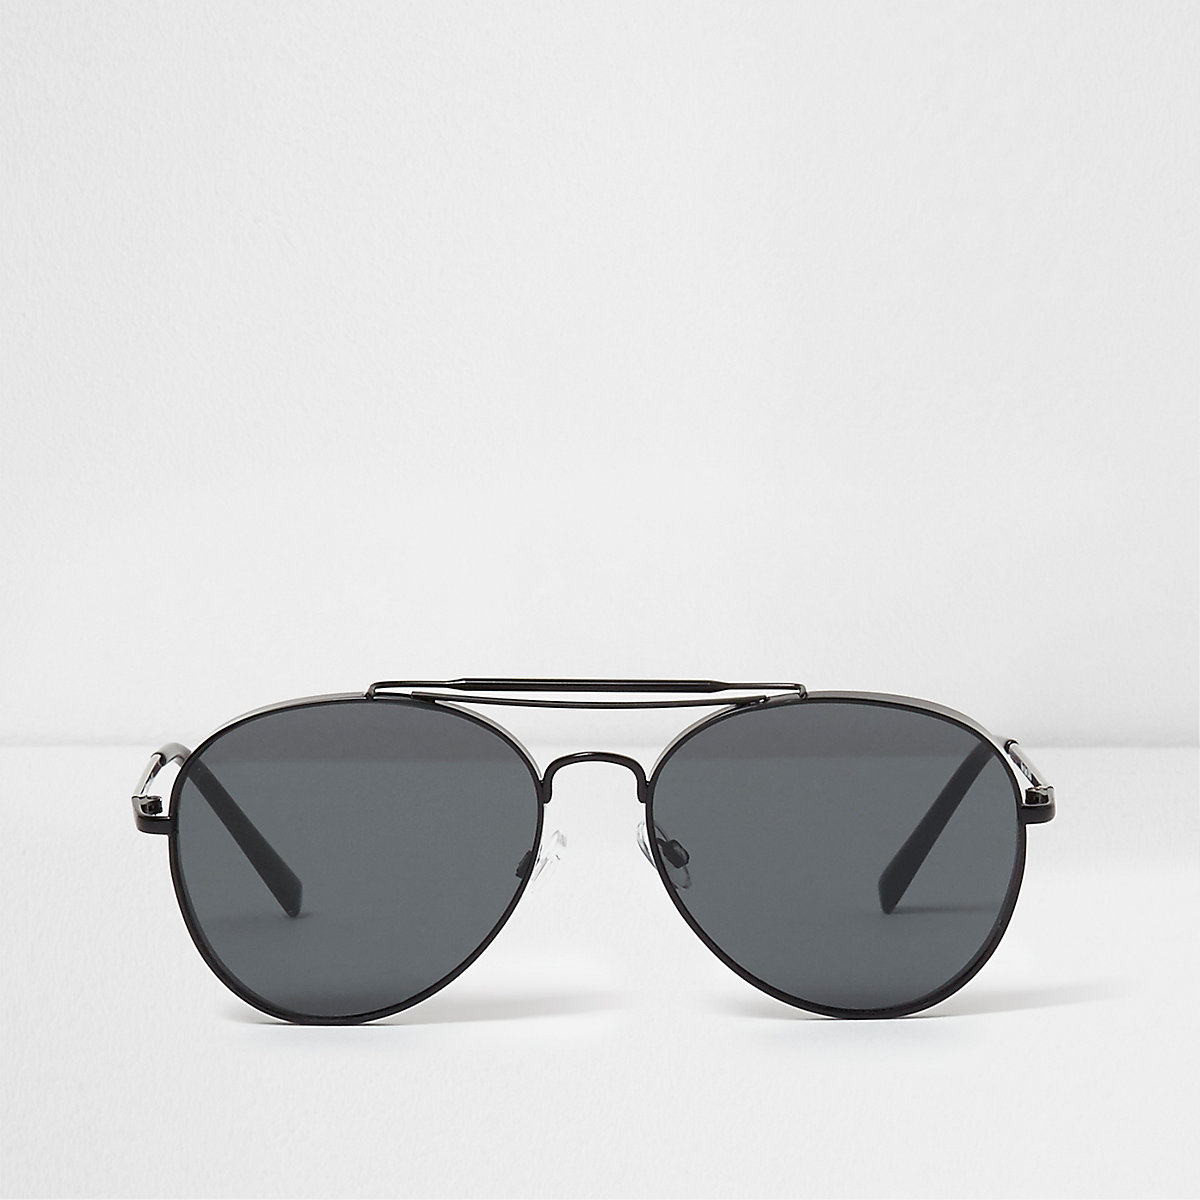 Black smoke lens oval aviator sunglasses